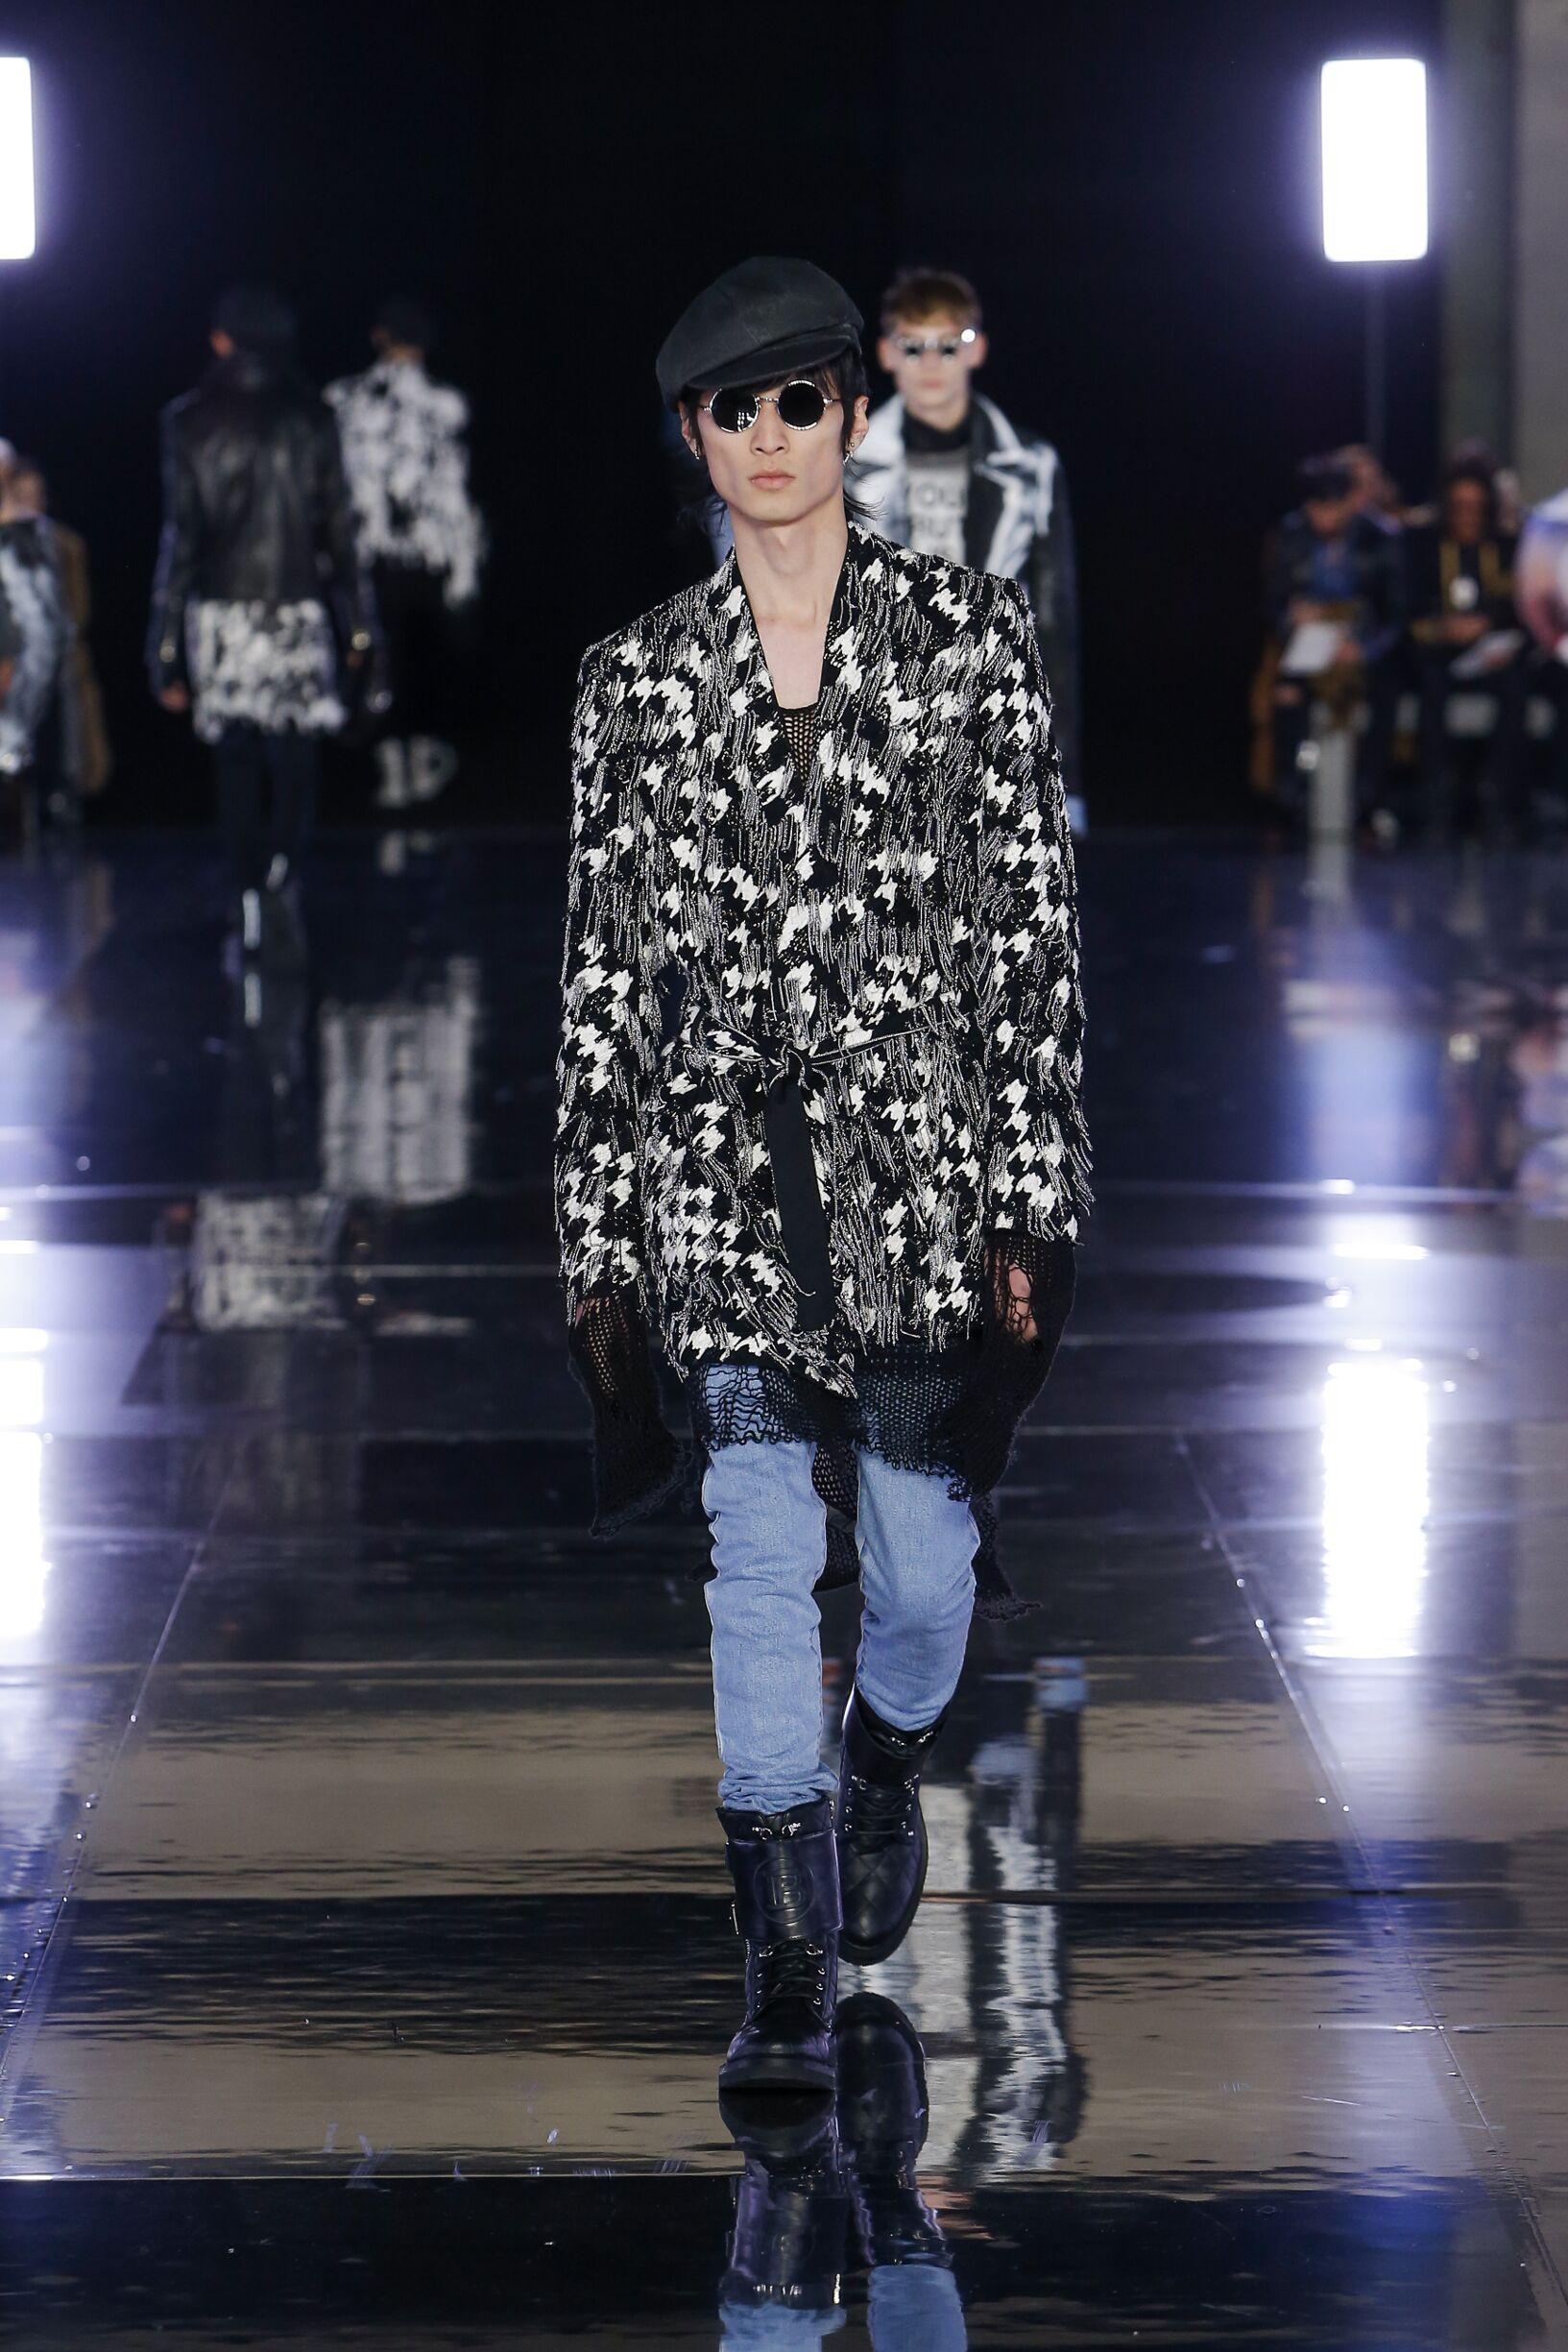 Fall Winter Fashion Trends 2019 Balmain